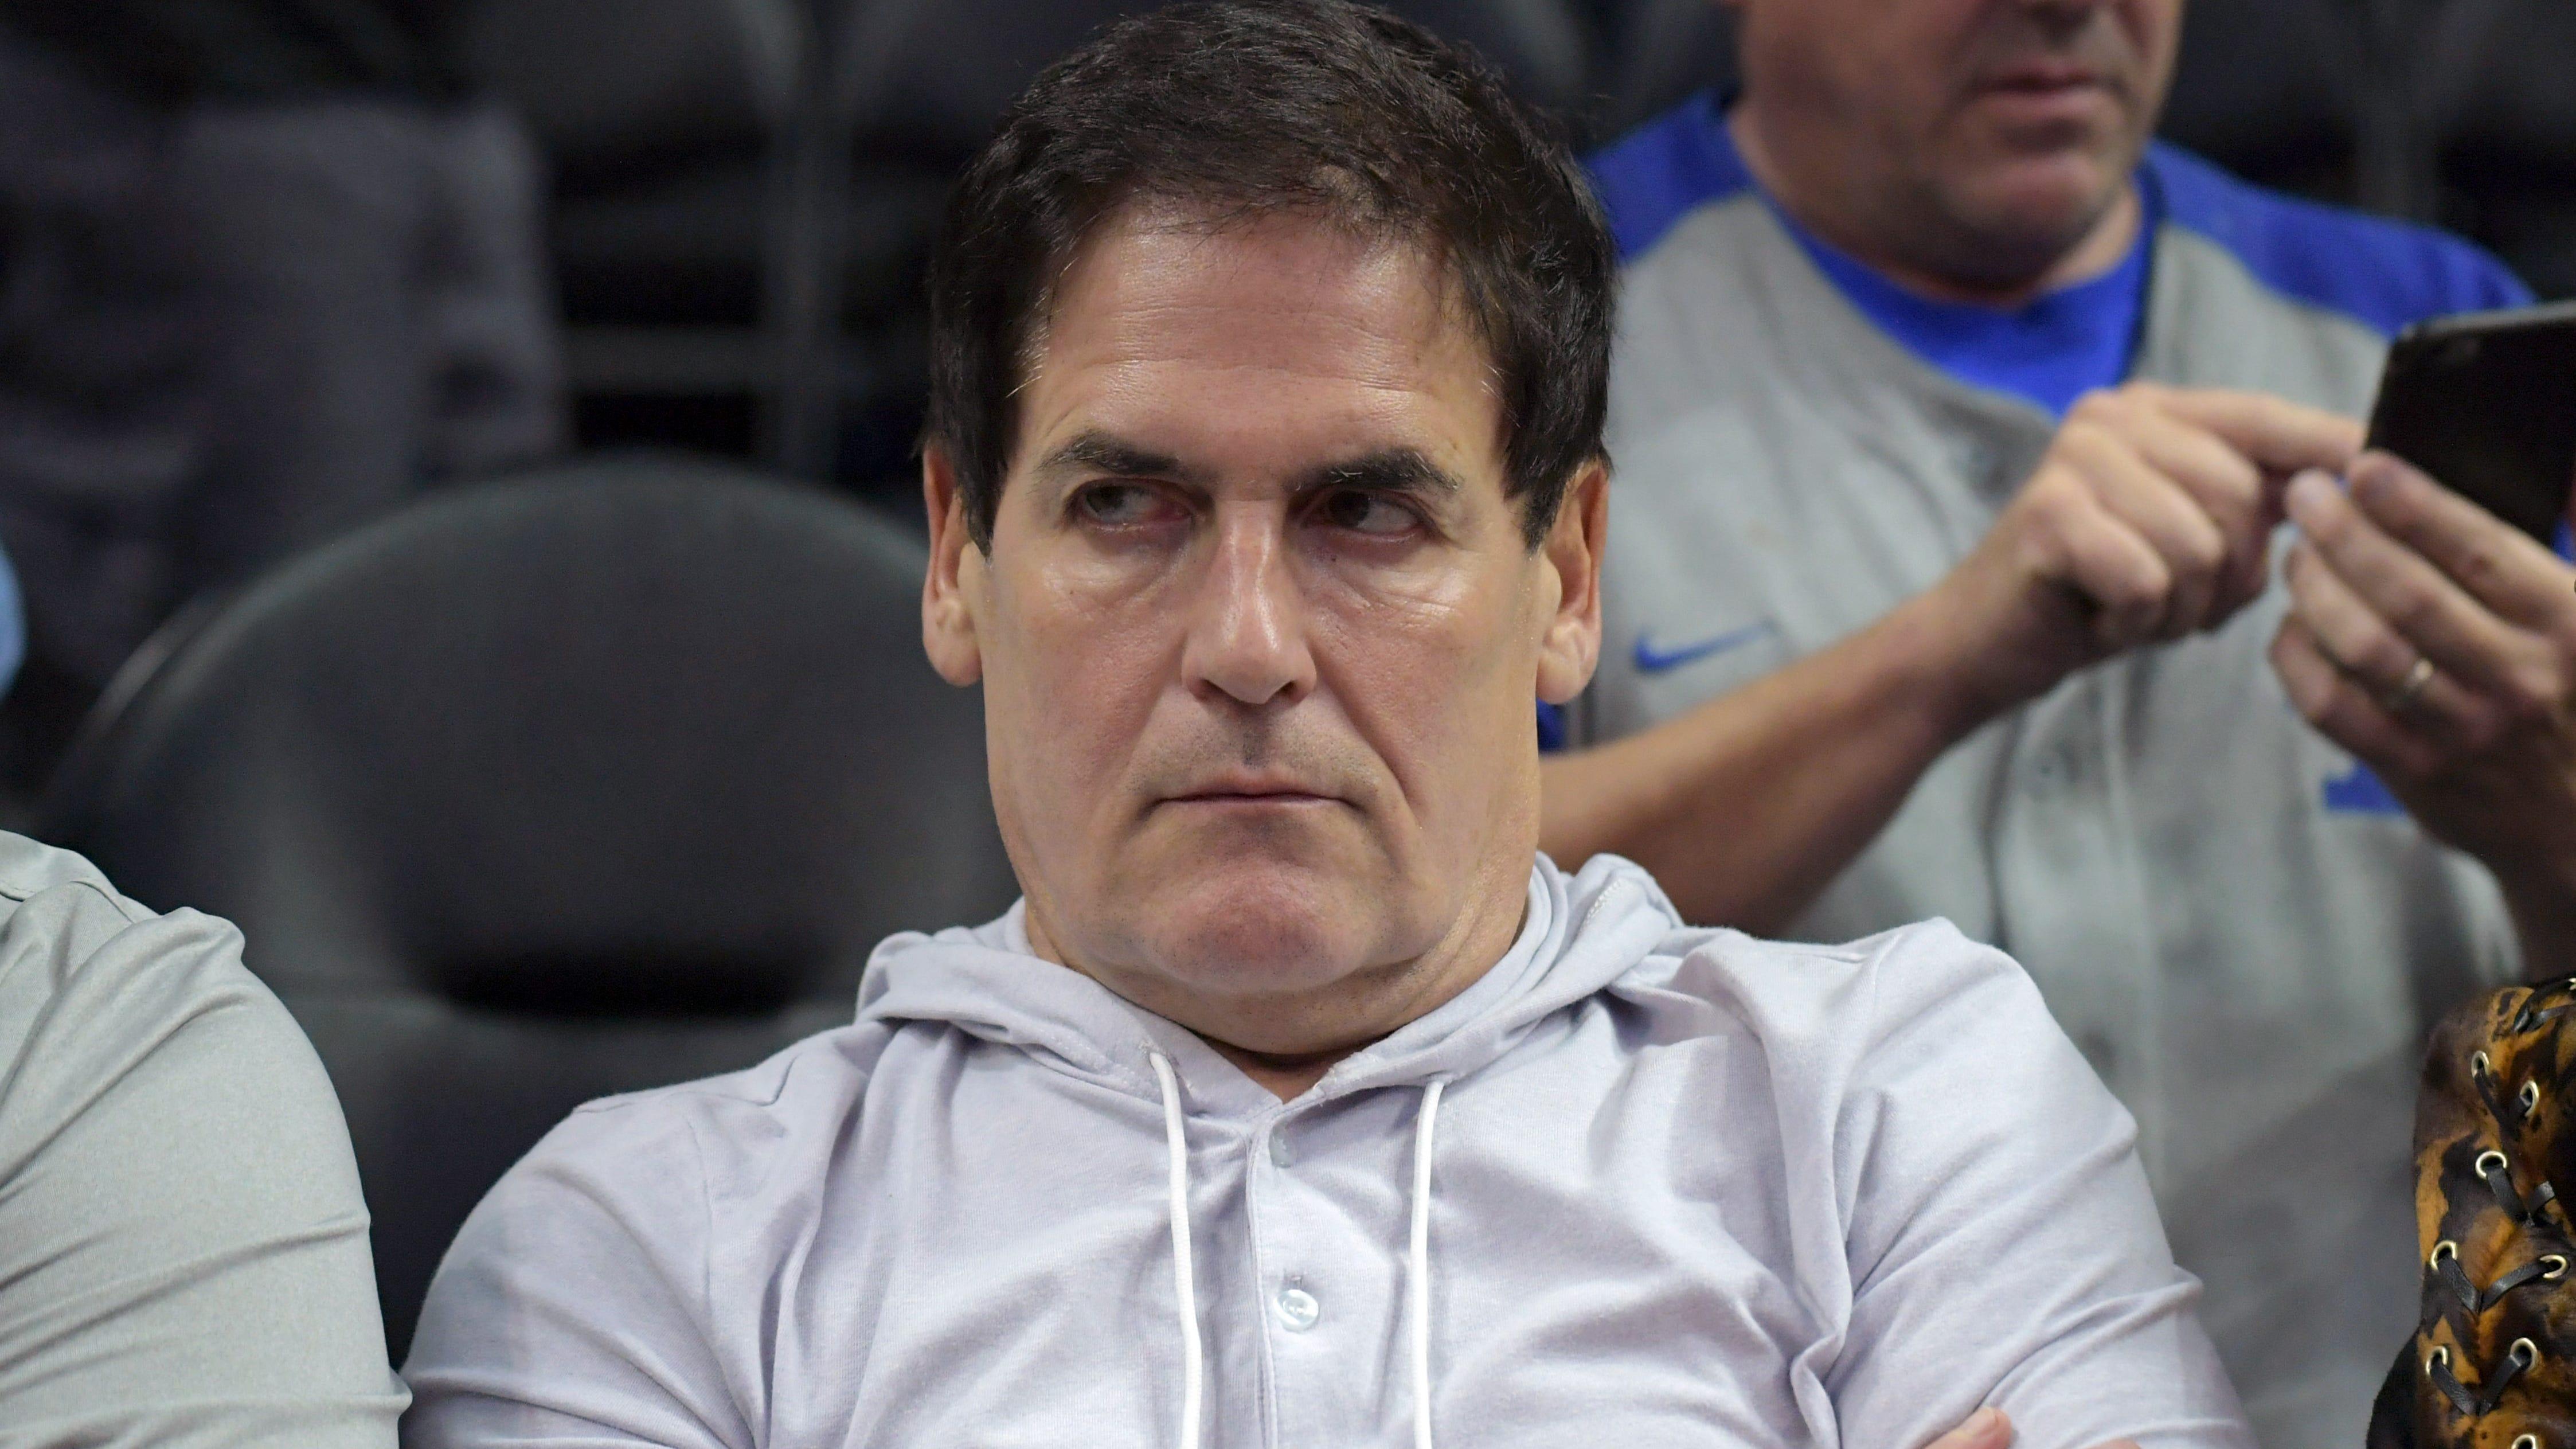 Mark Cuban on Mavericks workplace misconduct: 'I'm just sorry I didn't see it'